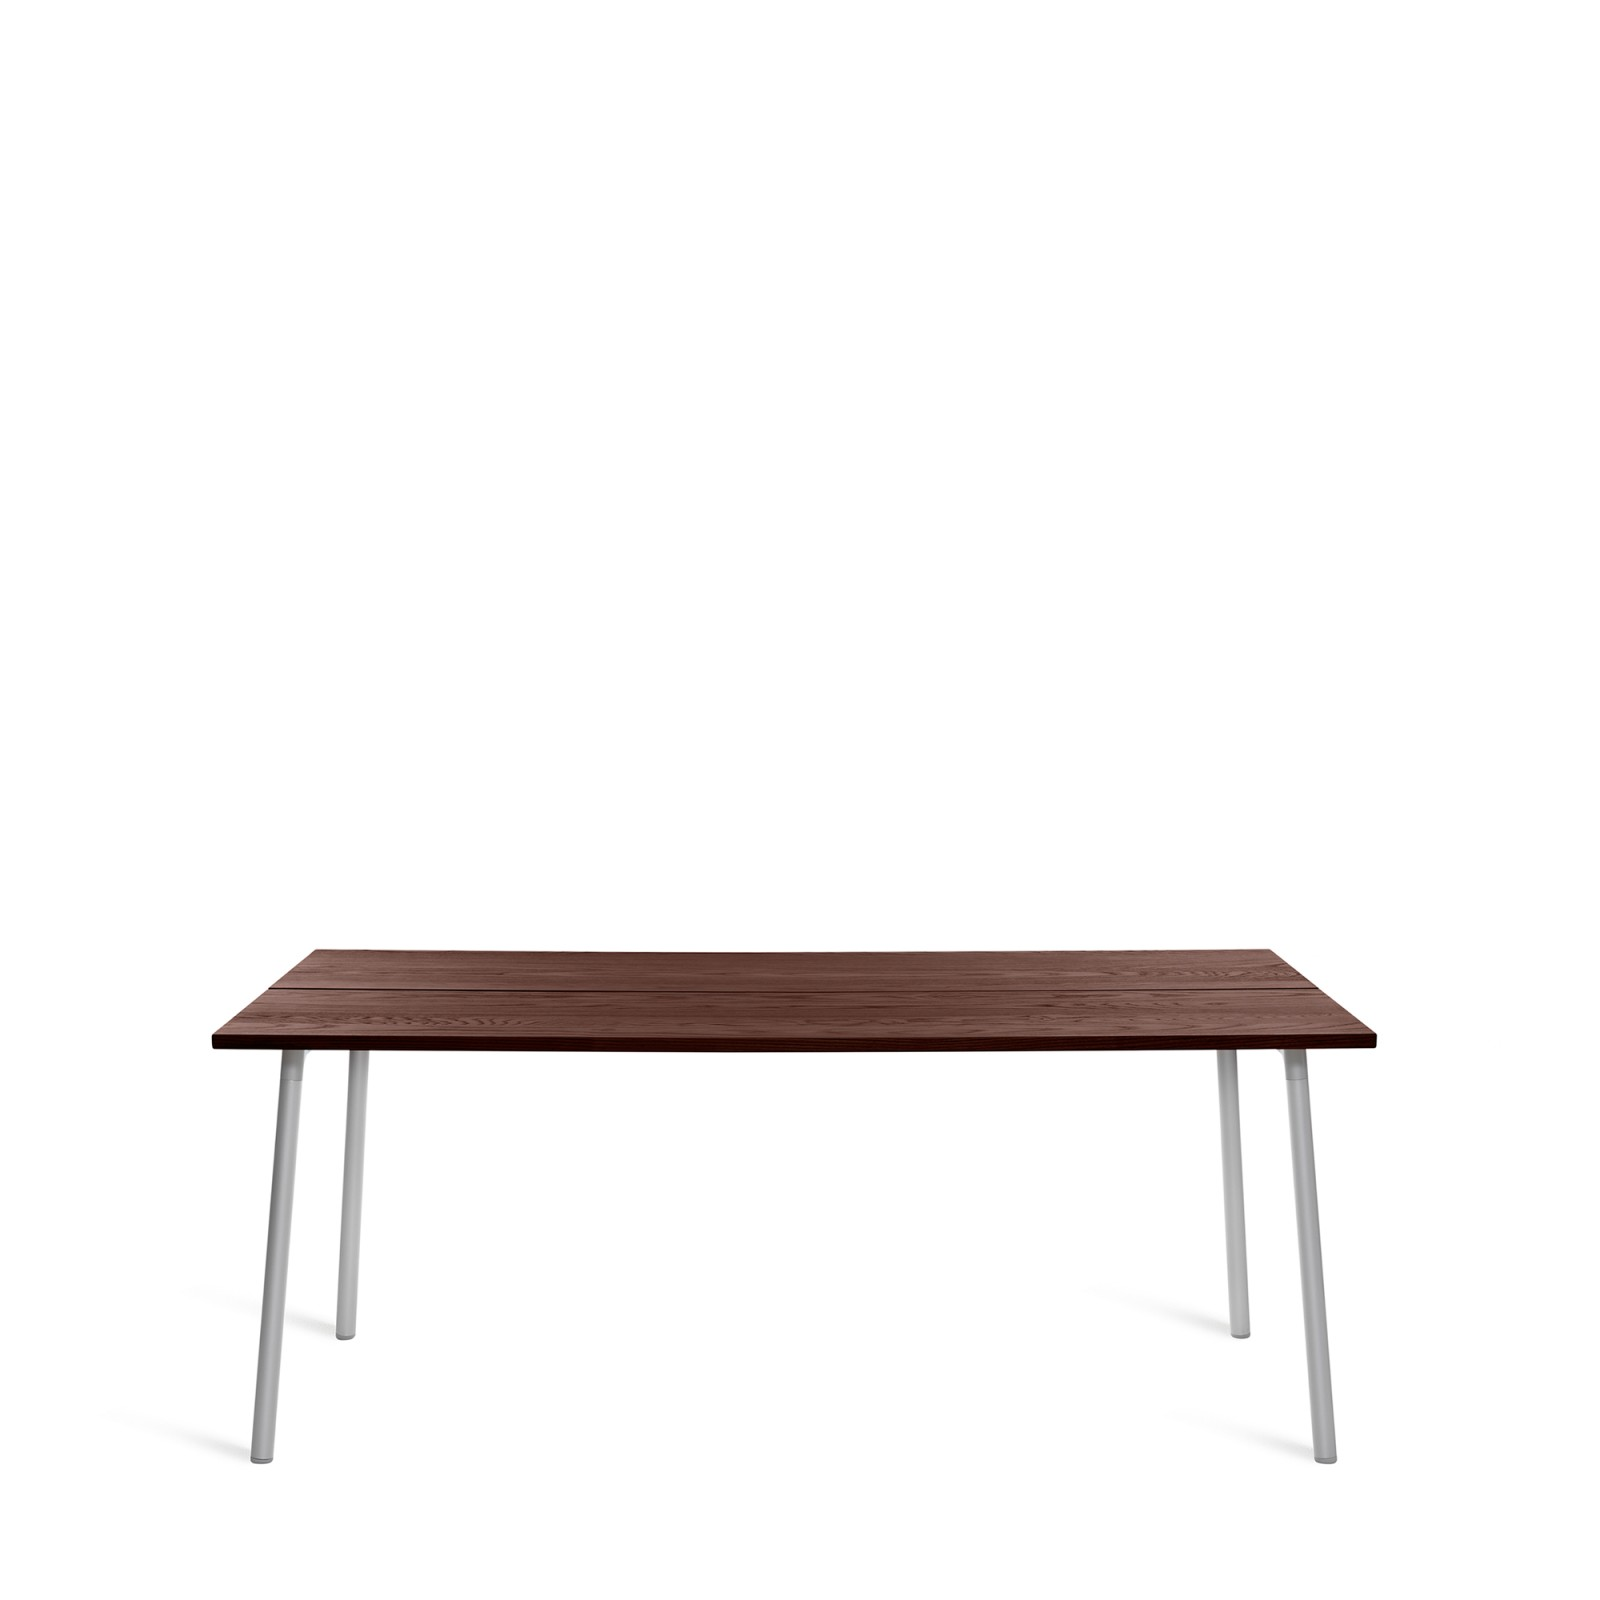 Run Dining Table Rectangular 183cm, Clear Aluminium, Walnut